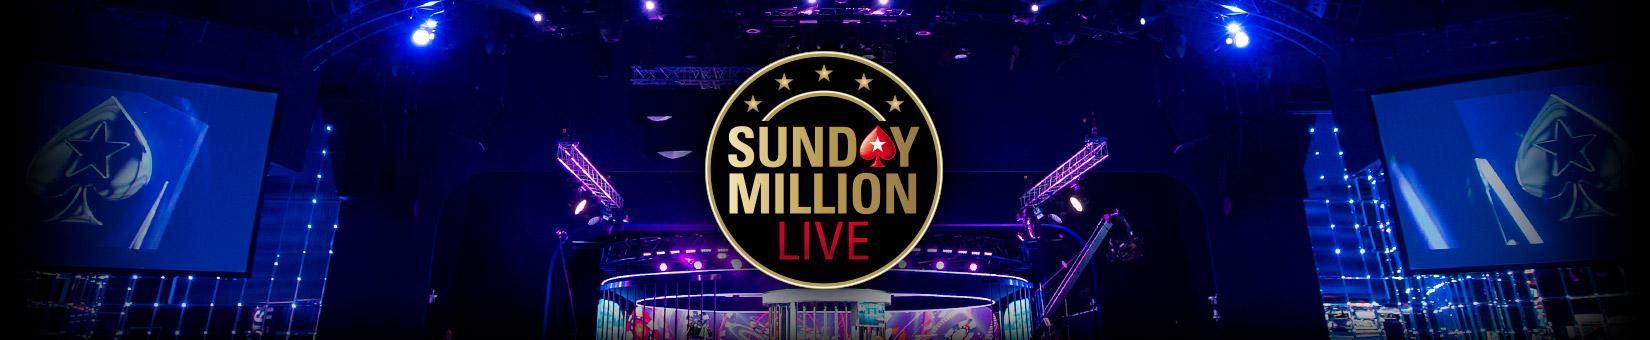 PokerStars анонсировали Sunday Million Live